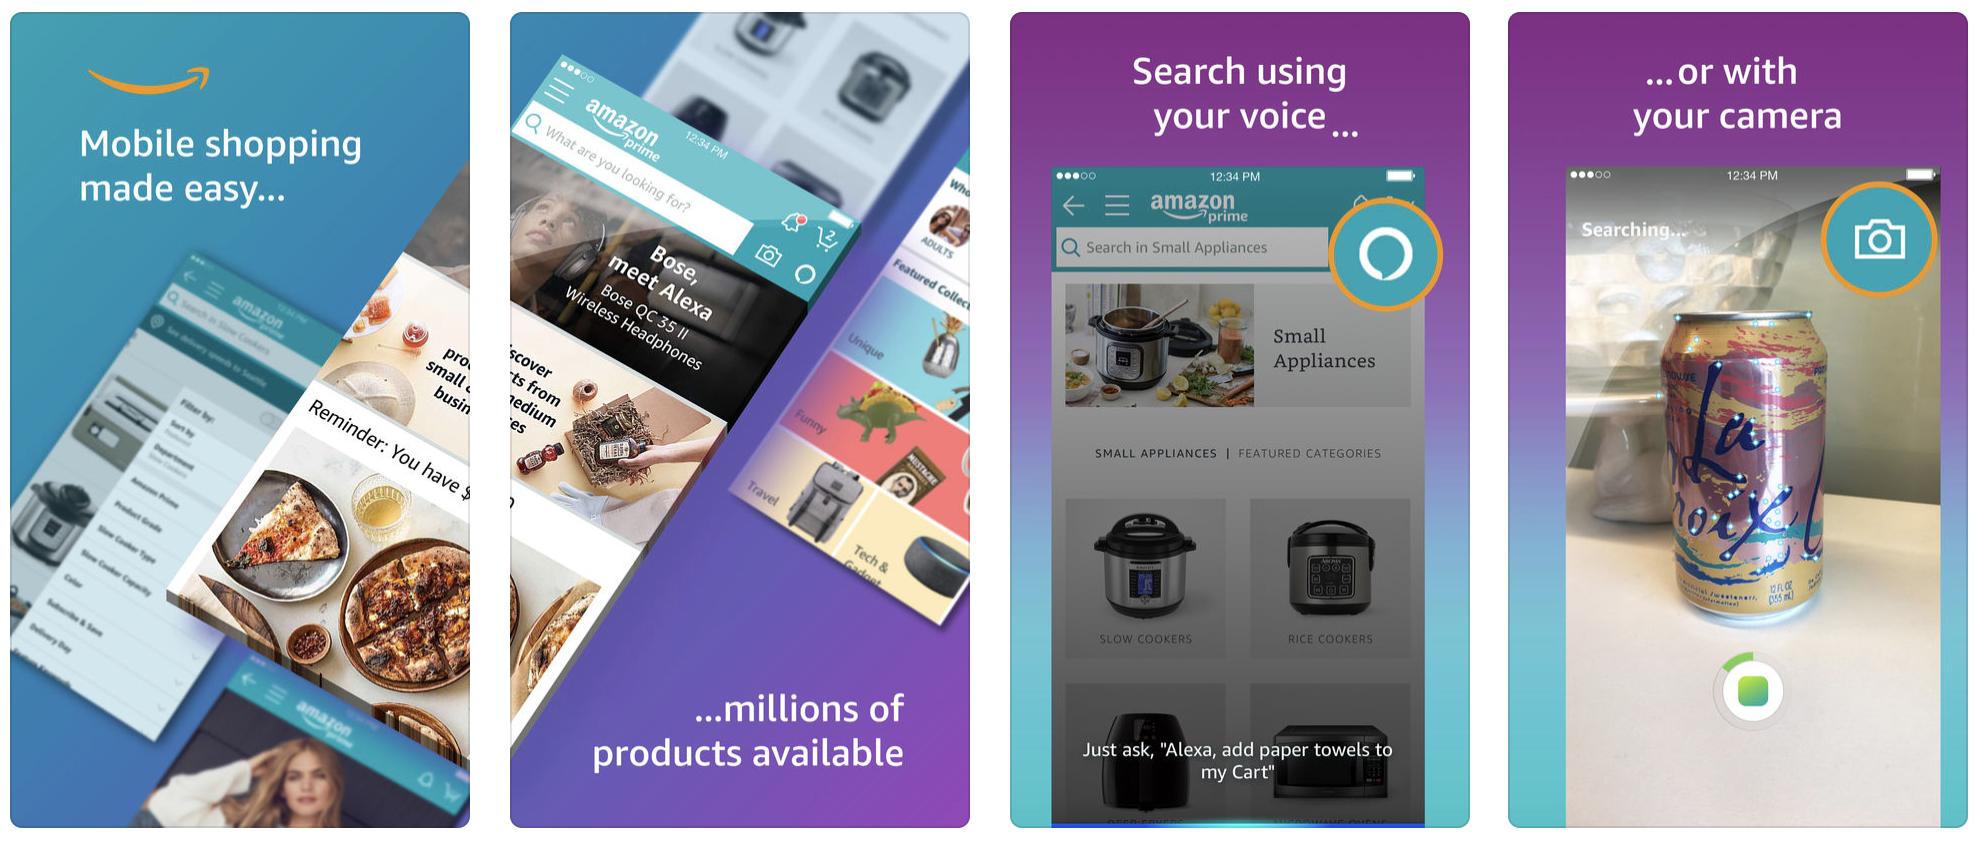 Amazon-iPhone-and-iPad-App-Screenshot.png